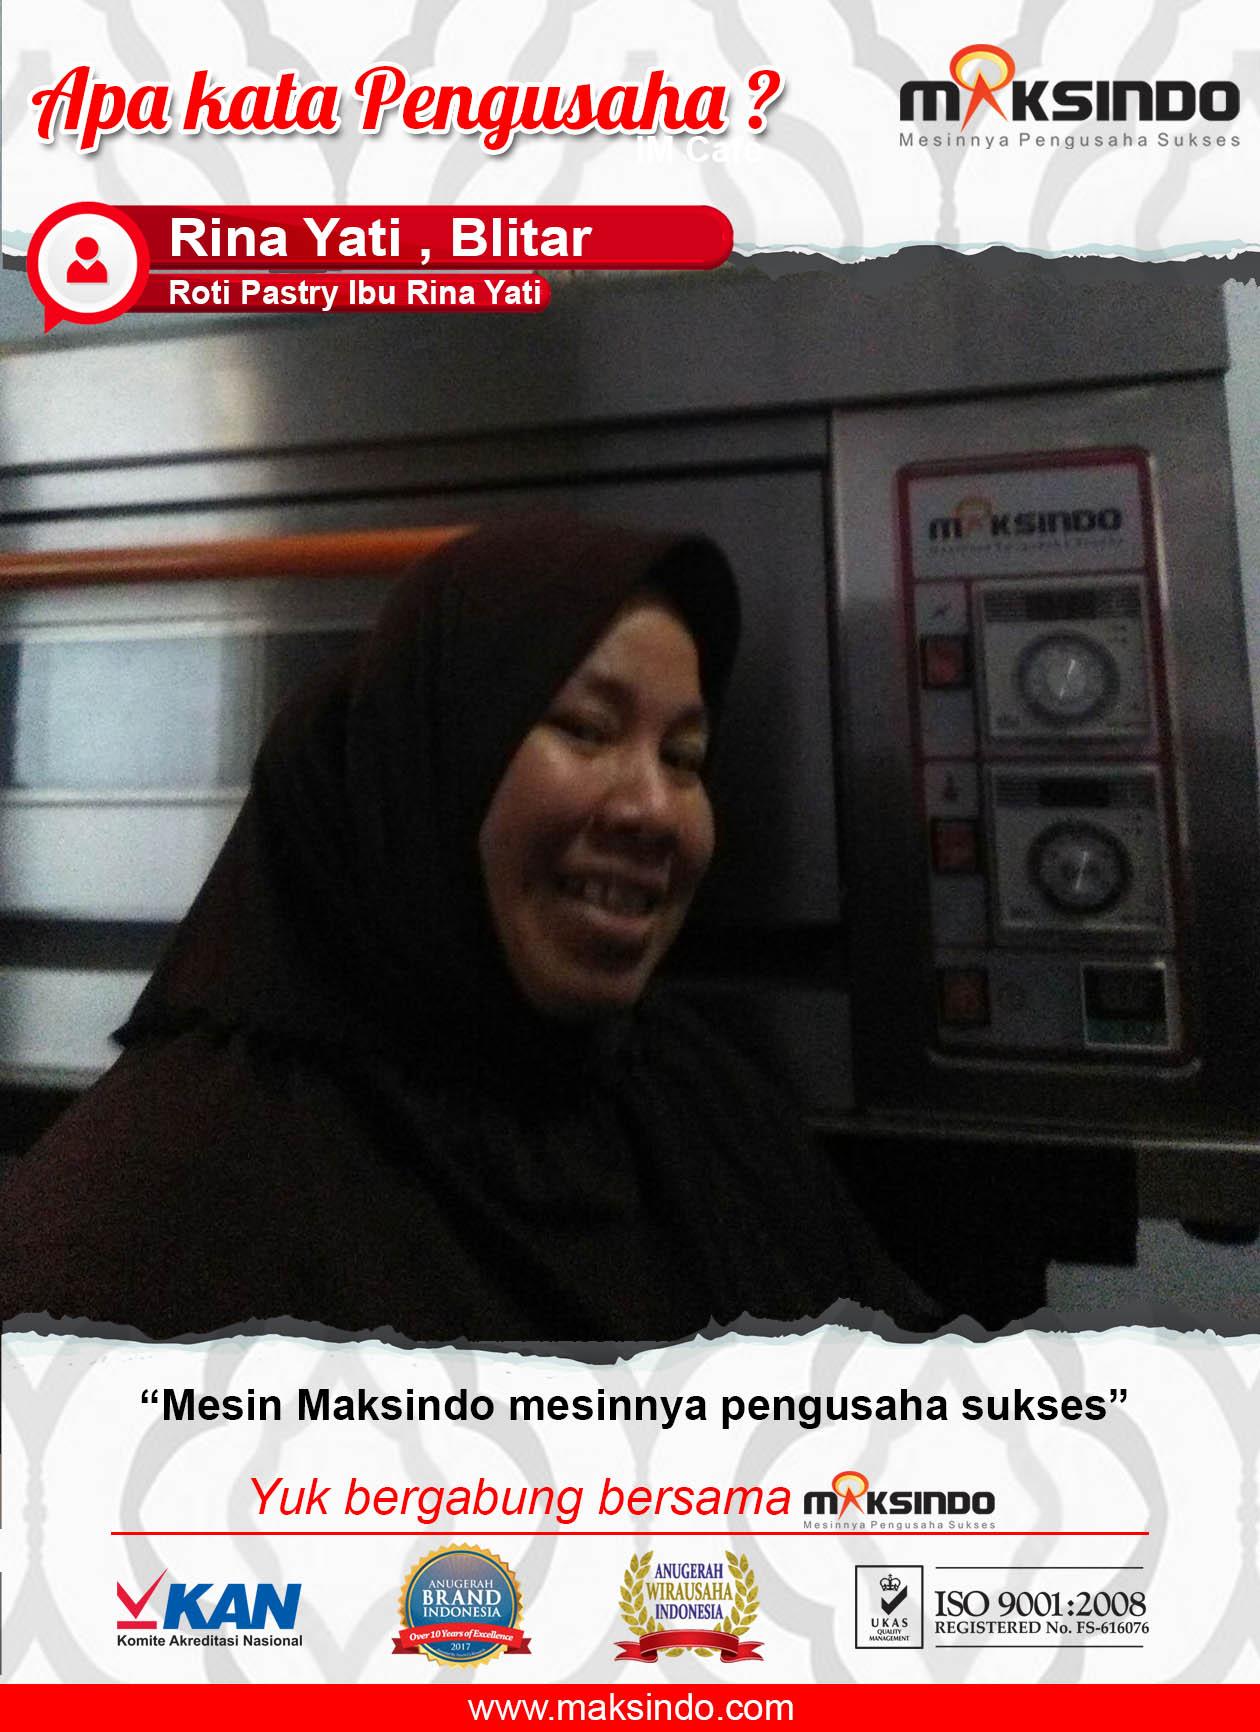 Roti Pastry Ibu Rina Yati: Mesin Maksindo Mesinnya Pengusaha Sukses